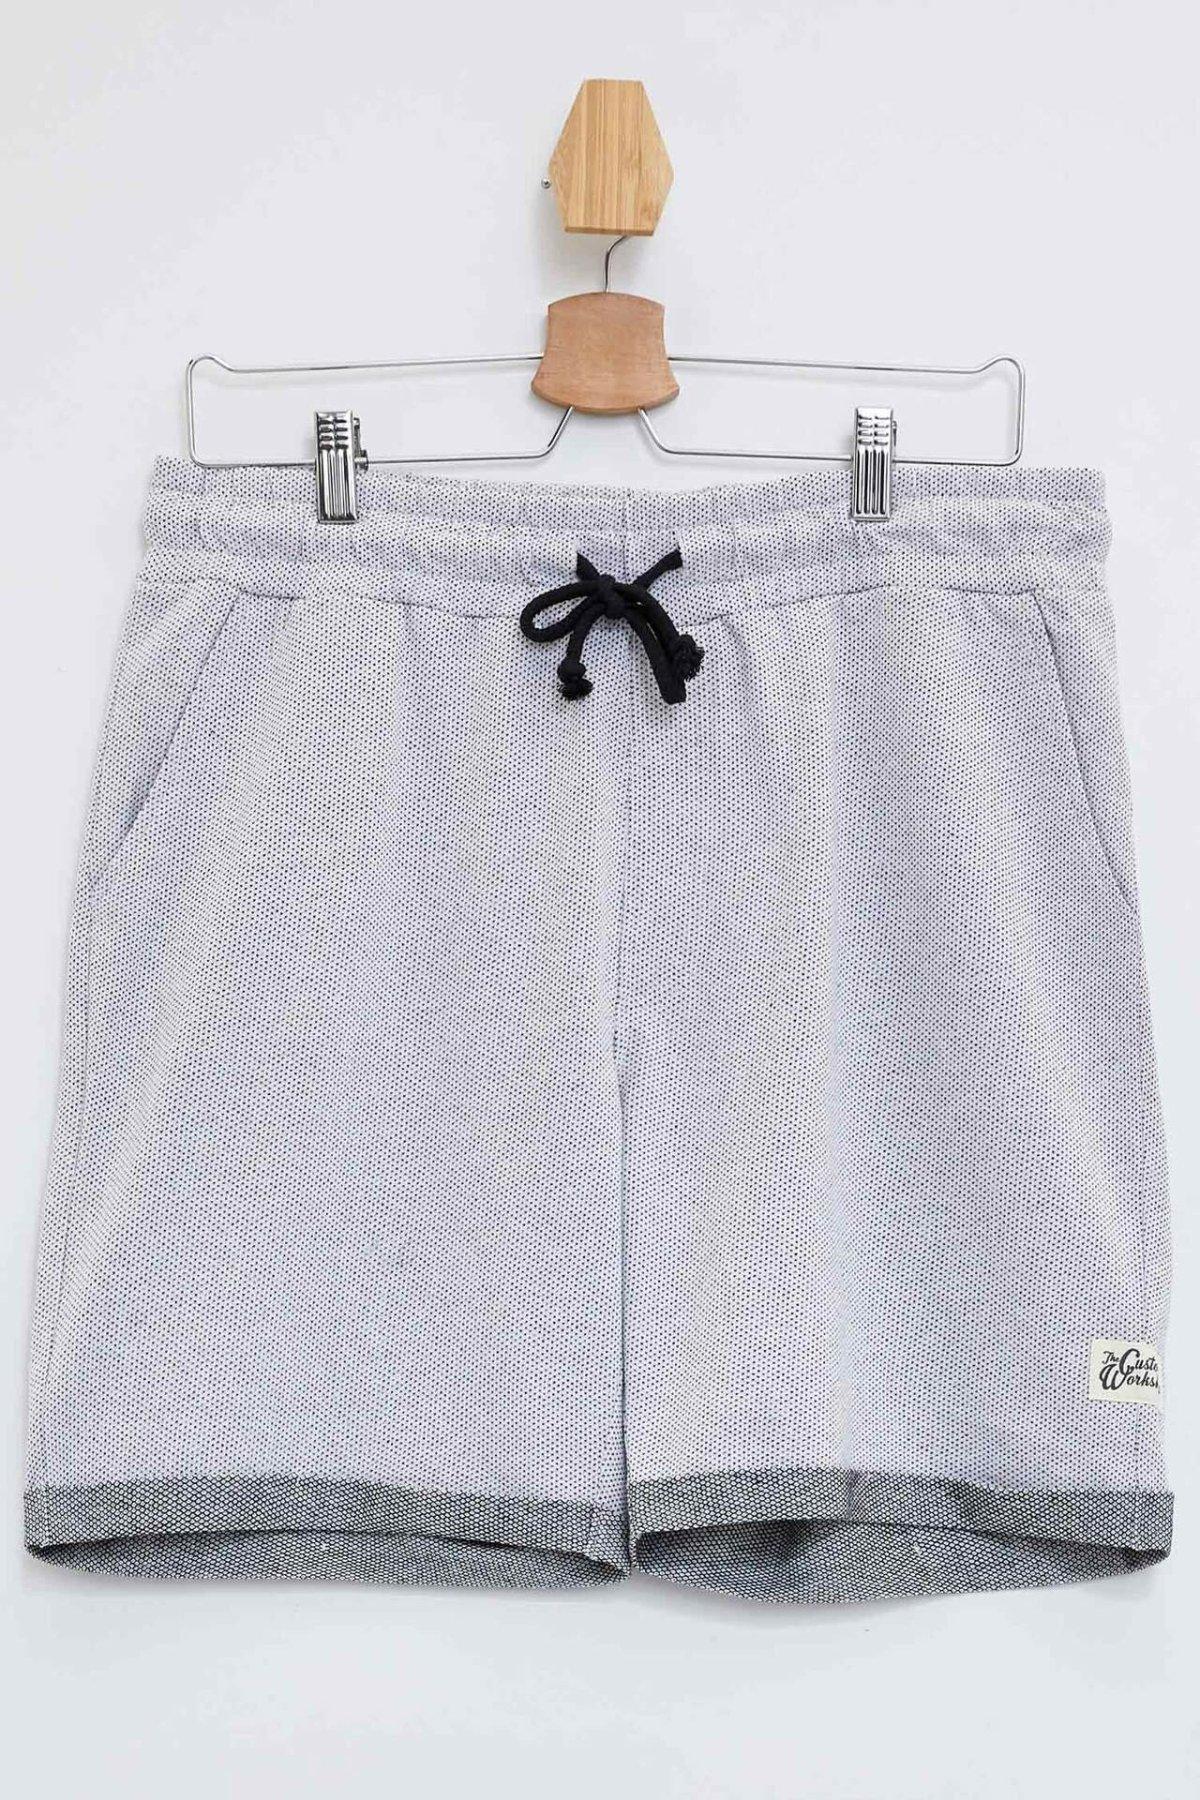 DeFacto Man's Summer Casual Short Men's Lace-up Bottoms Men's Light Grey Casual Shorts Men's Short Bottom-K3544AZ19SM